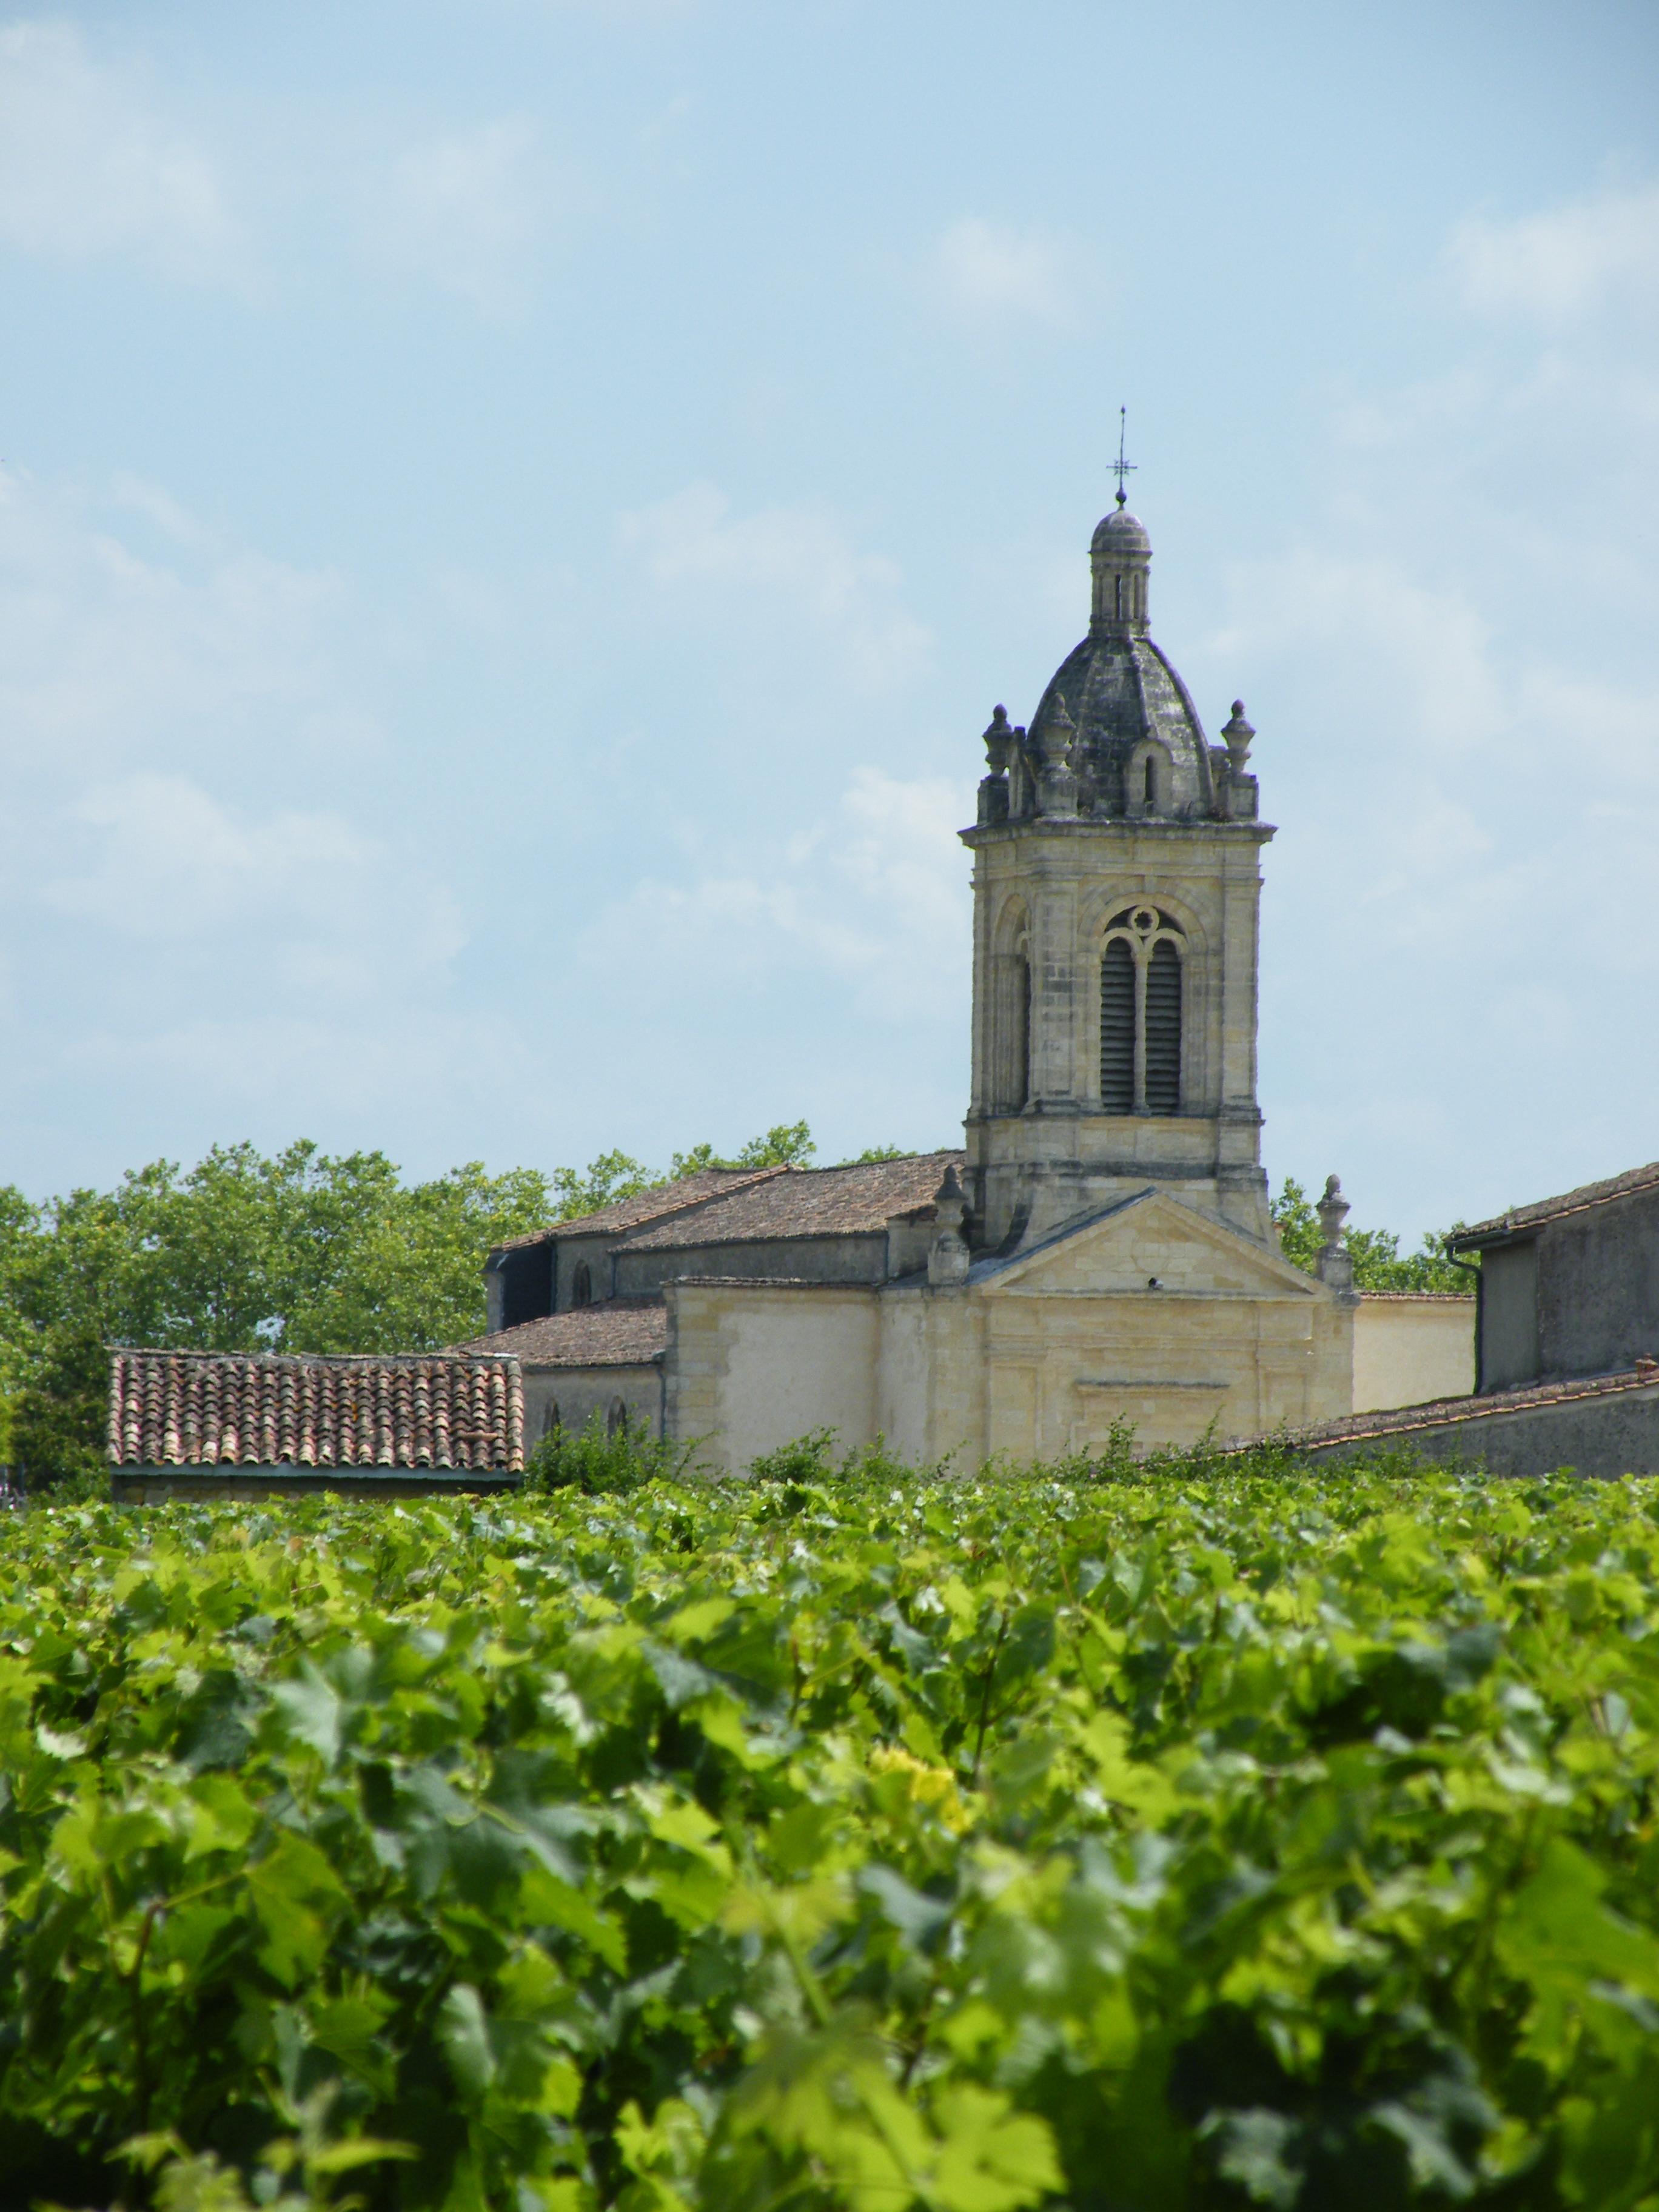 BordeauxSoYou-tarde-Wine Tour-vinedo Saint Emilion